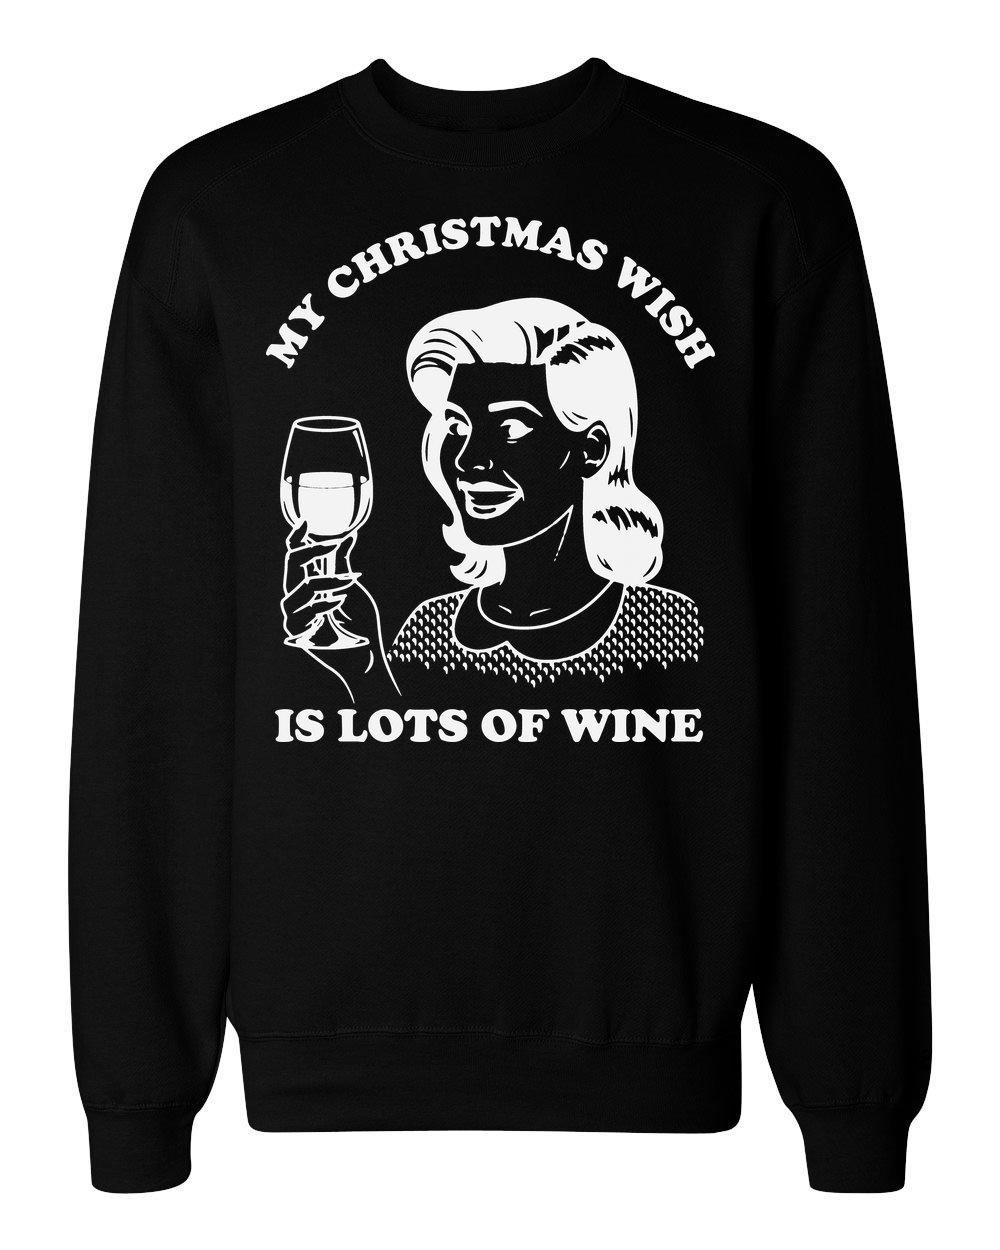 My Christmas Wish is Lots of Wine Vintage Woman with Glass of Wine Men's Women's Unisex Sweatshirt XX-Large